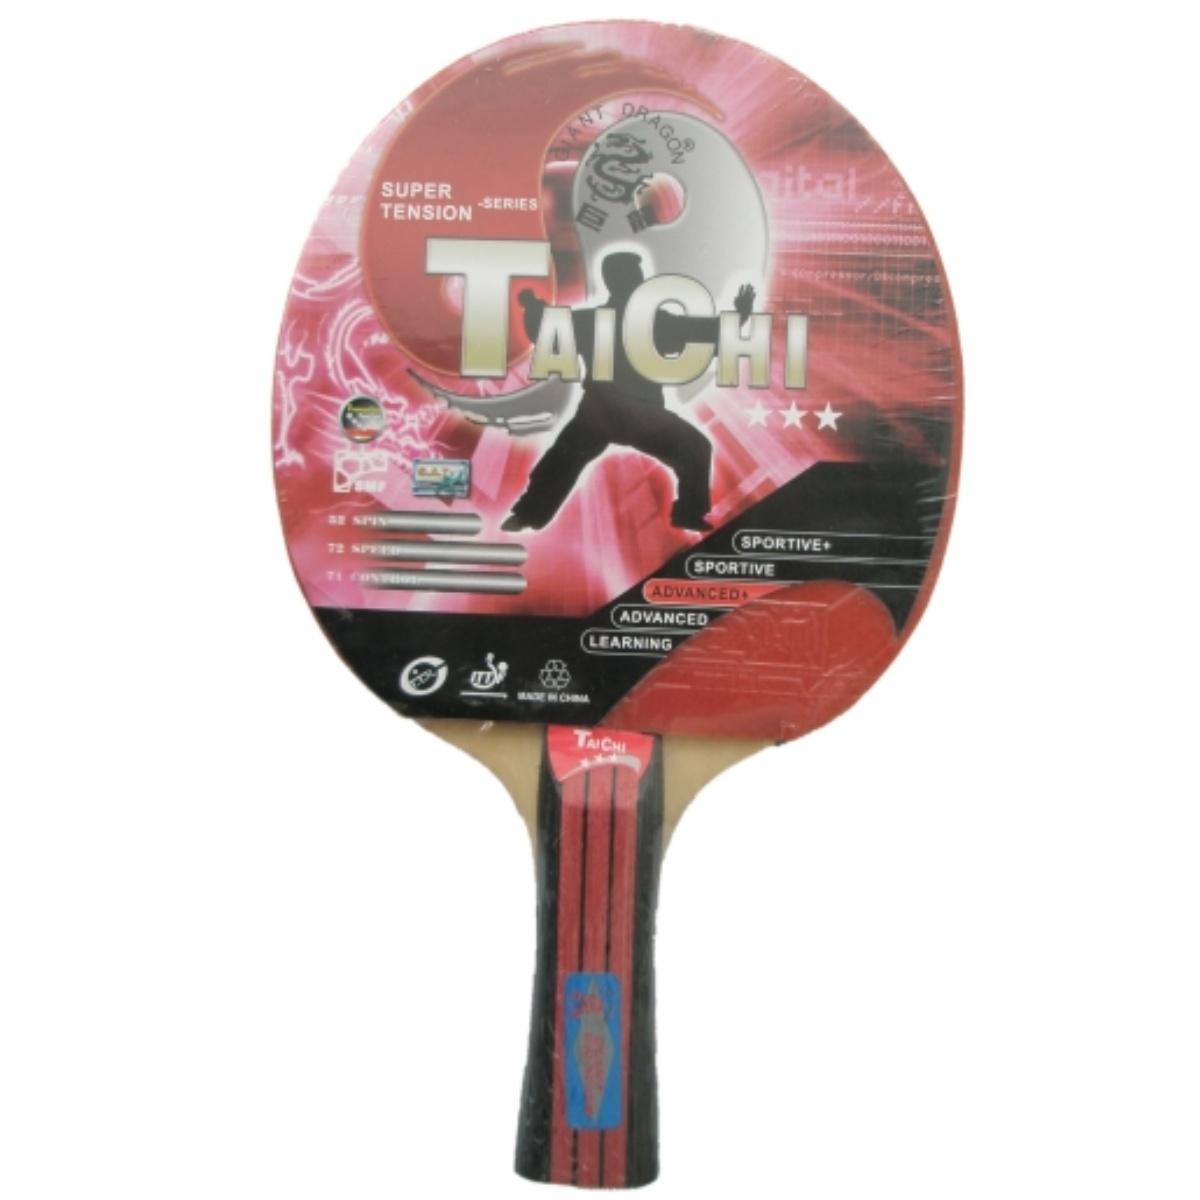 Pálka na stolní tenis ITTF Taichi 3*